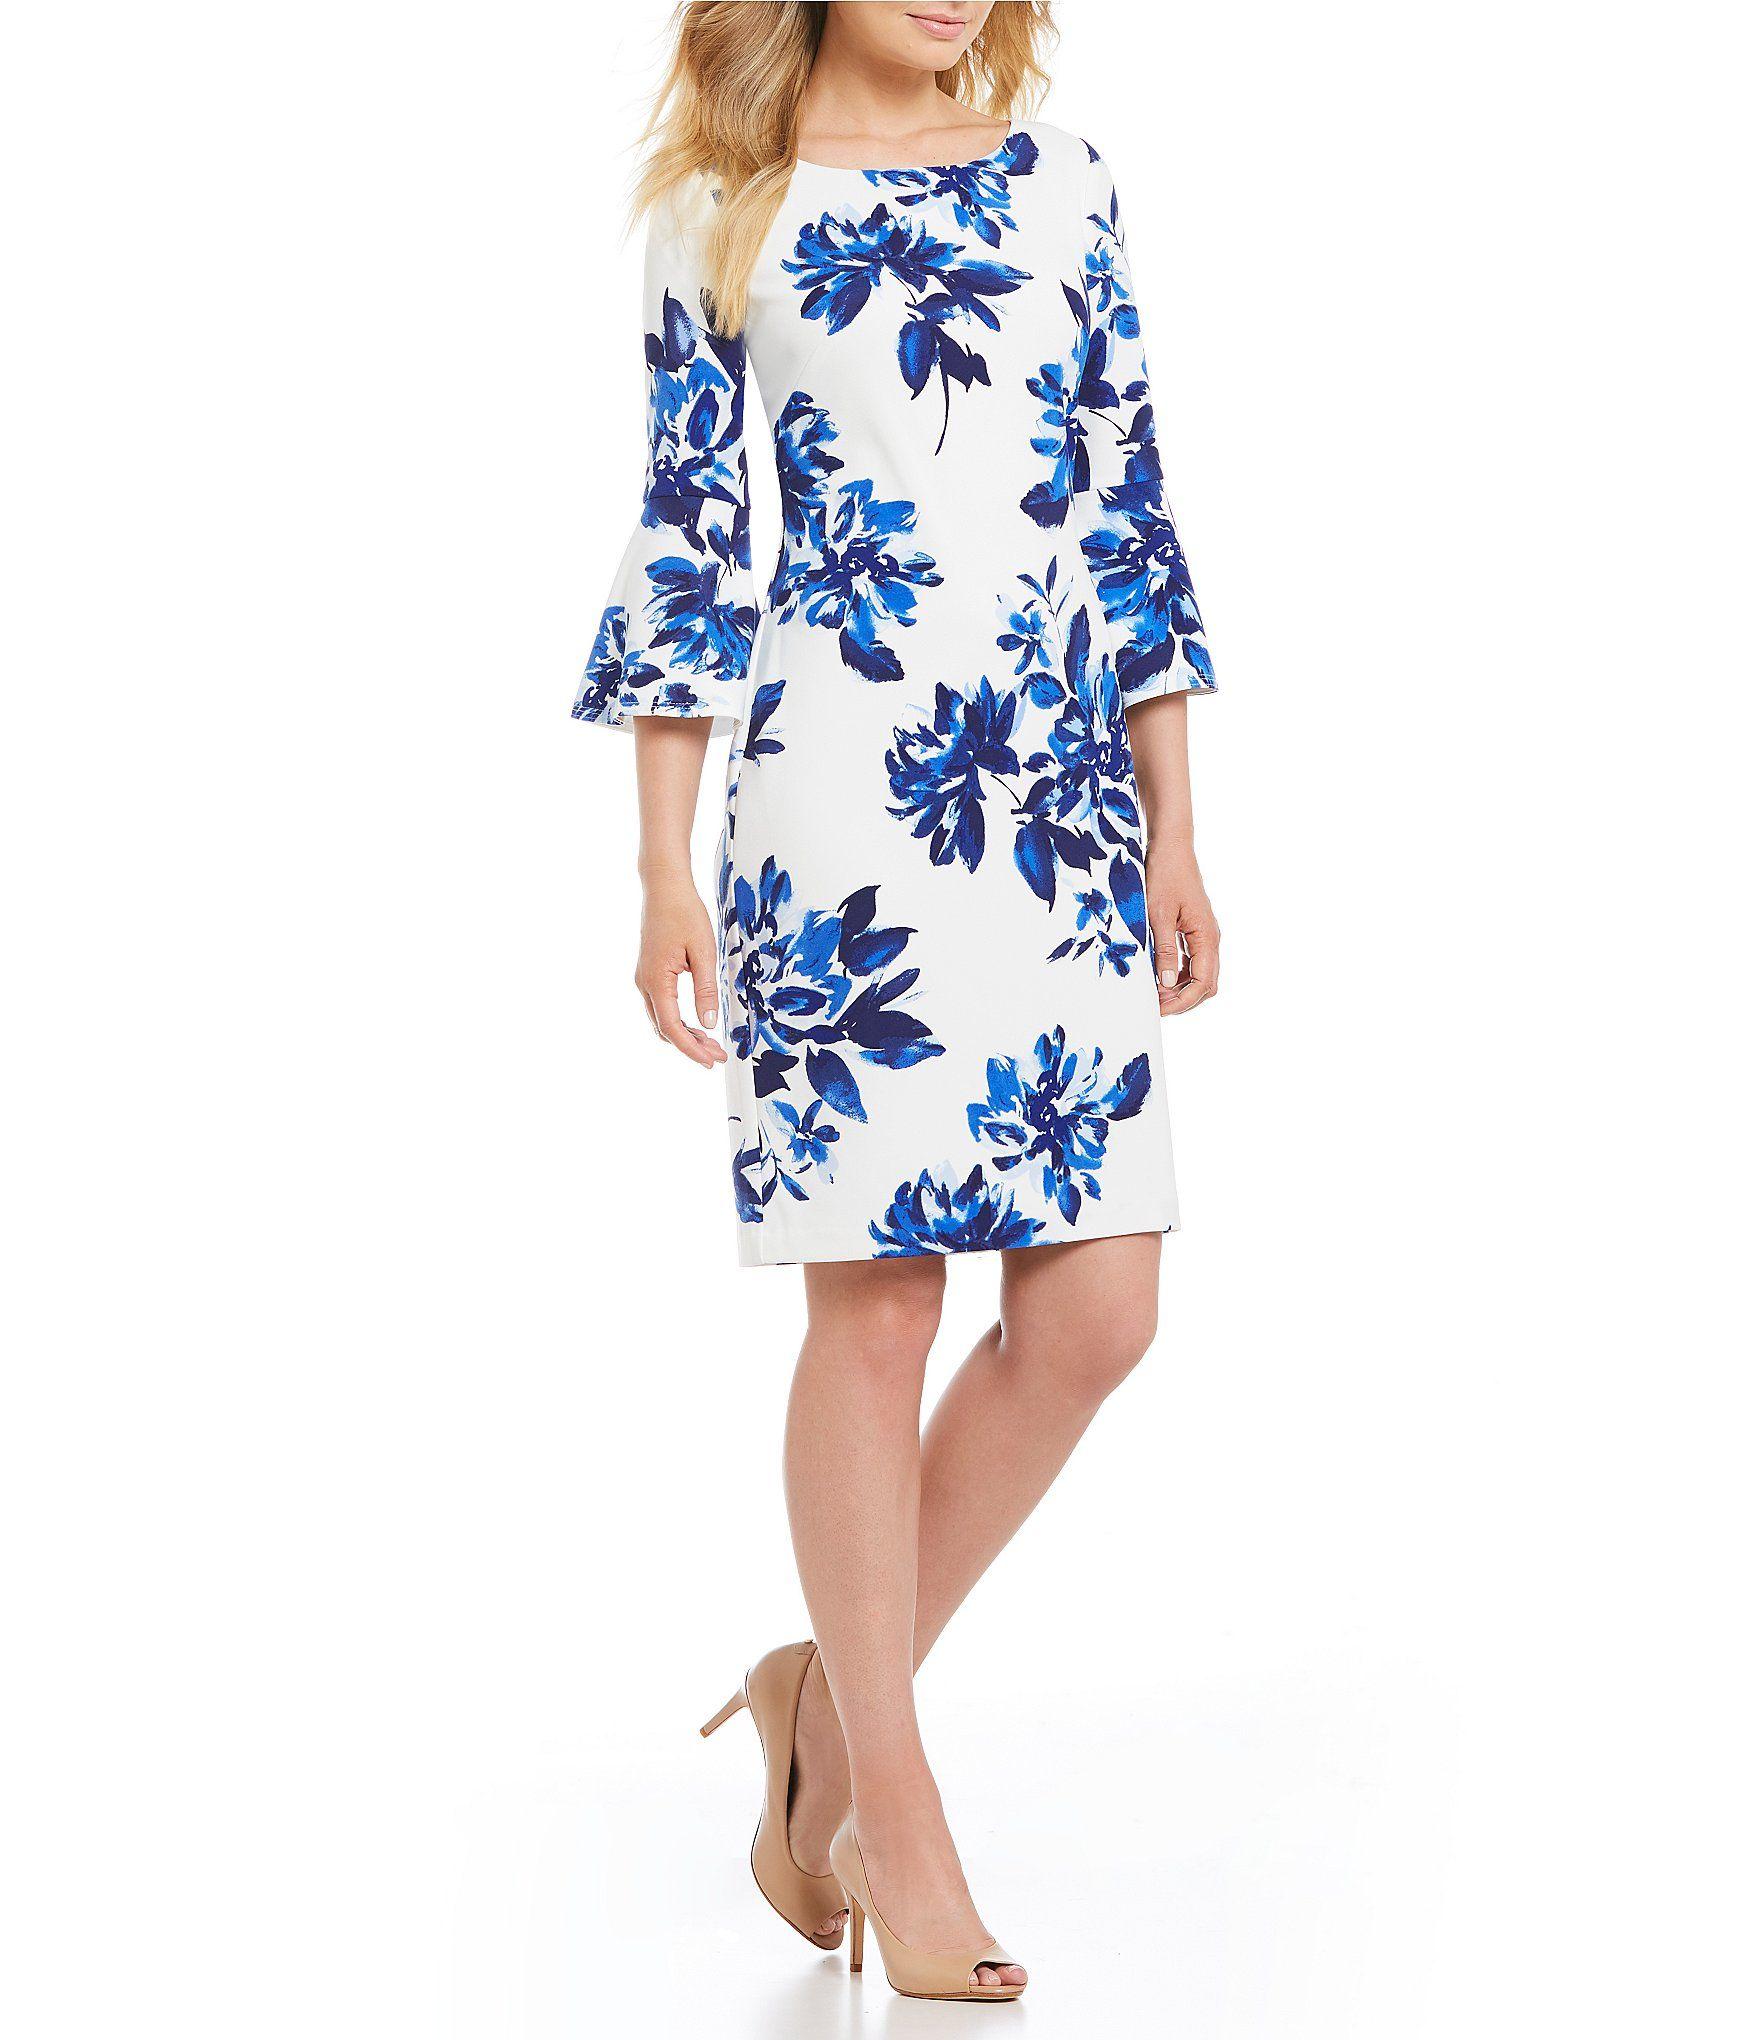 c2c21a64b3 Jessica Howard Petite Bell Sleeve Floral Dress  Dillards ...